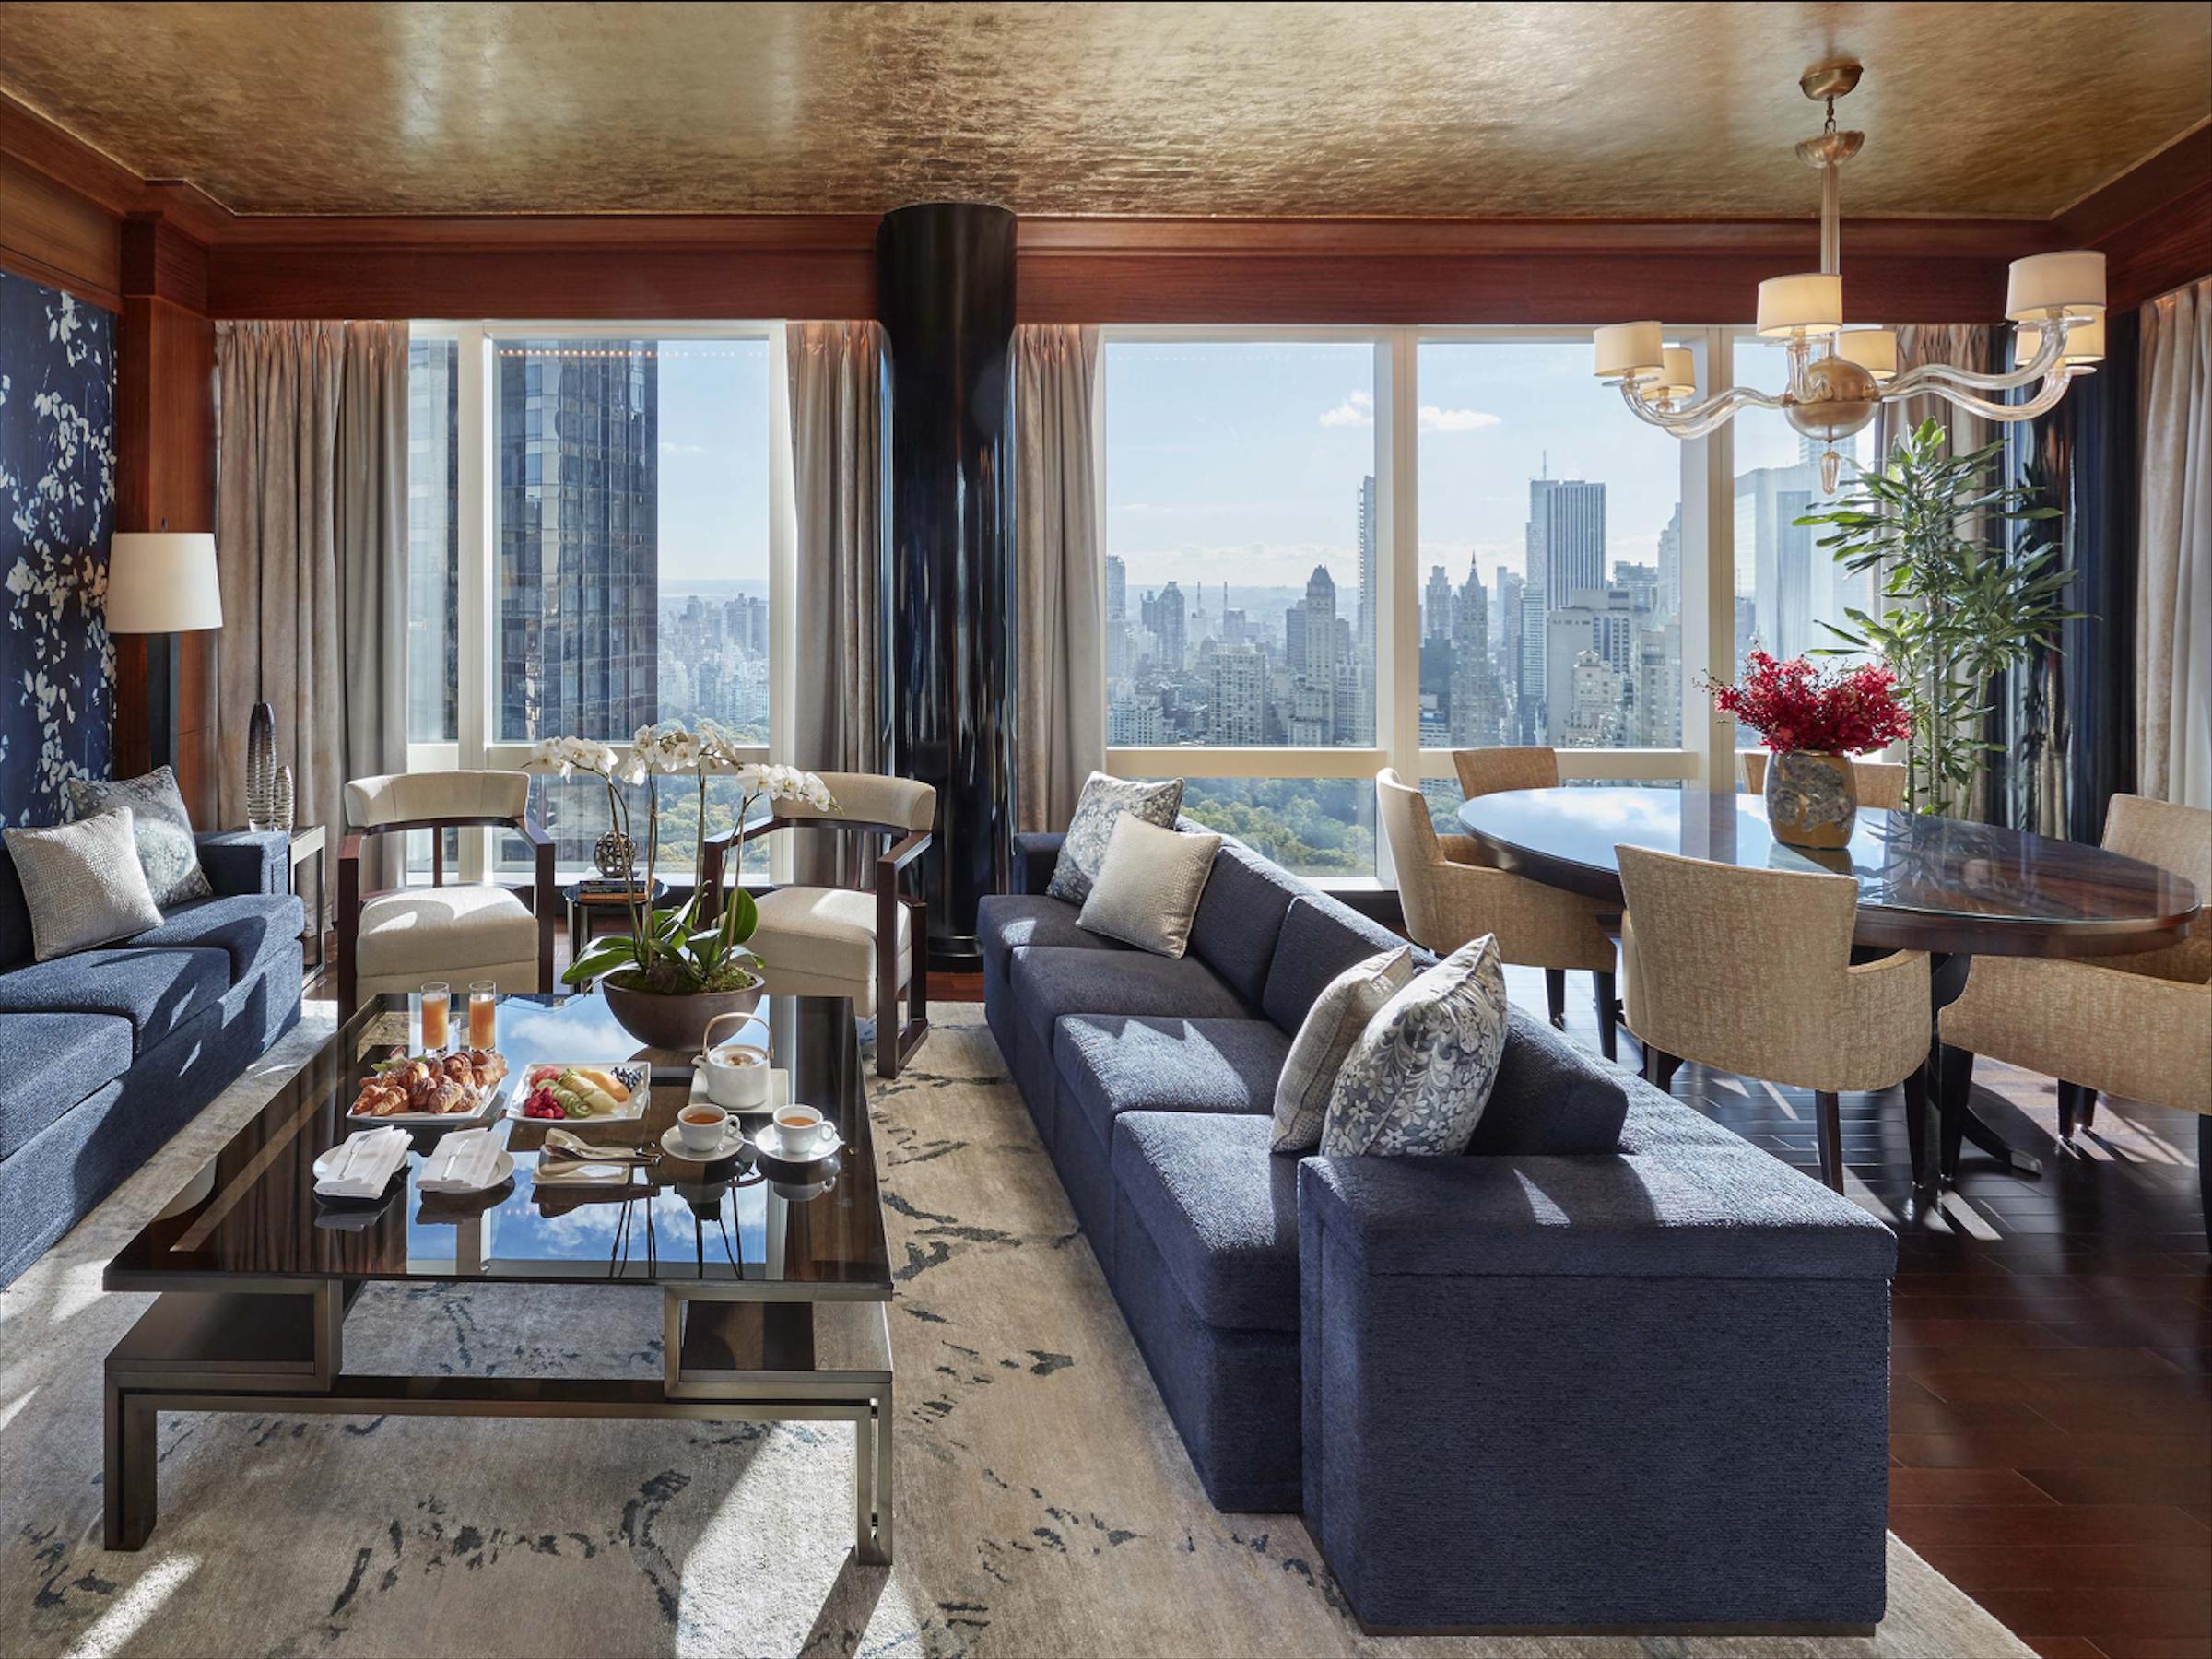 Mandarin Oriental New York✩✩✩✩✩ - Номера с видом: Premier central park view room или Oriental suiteОт $515 за ночь(В зависимости от сезона)Район: Columbus Circle